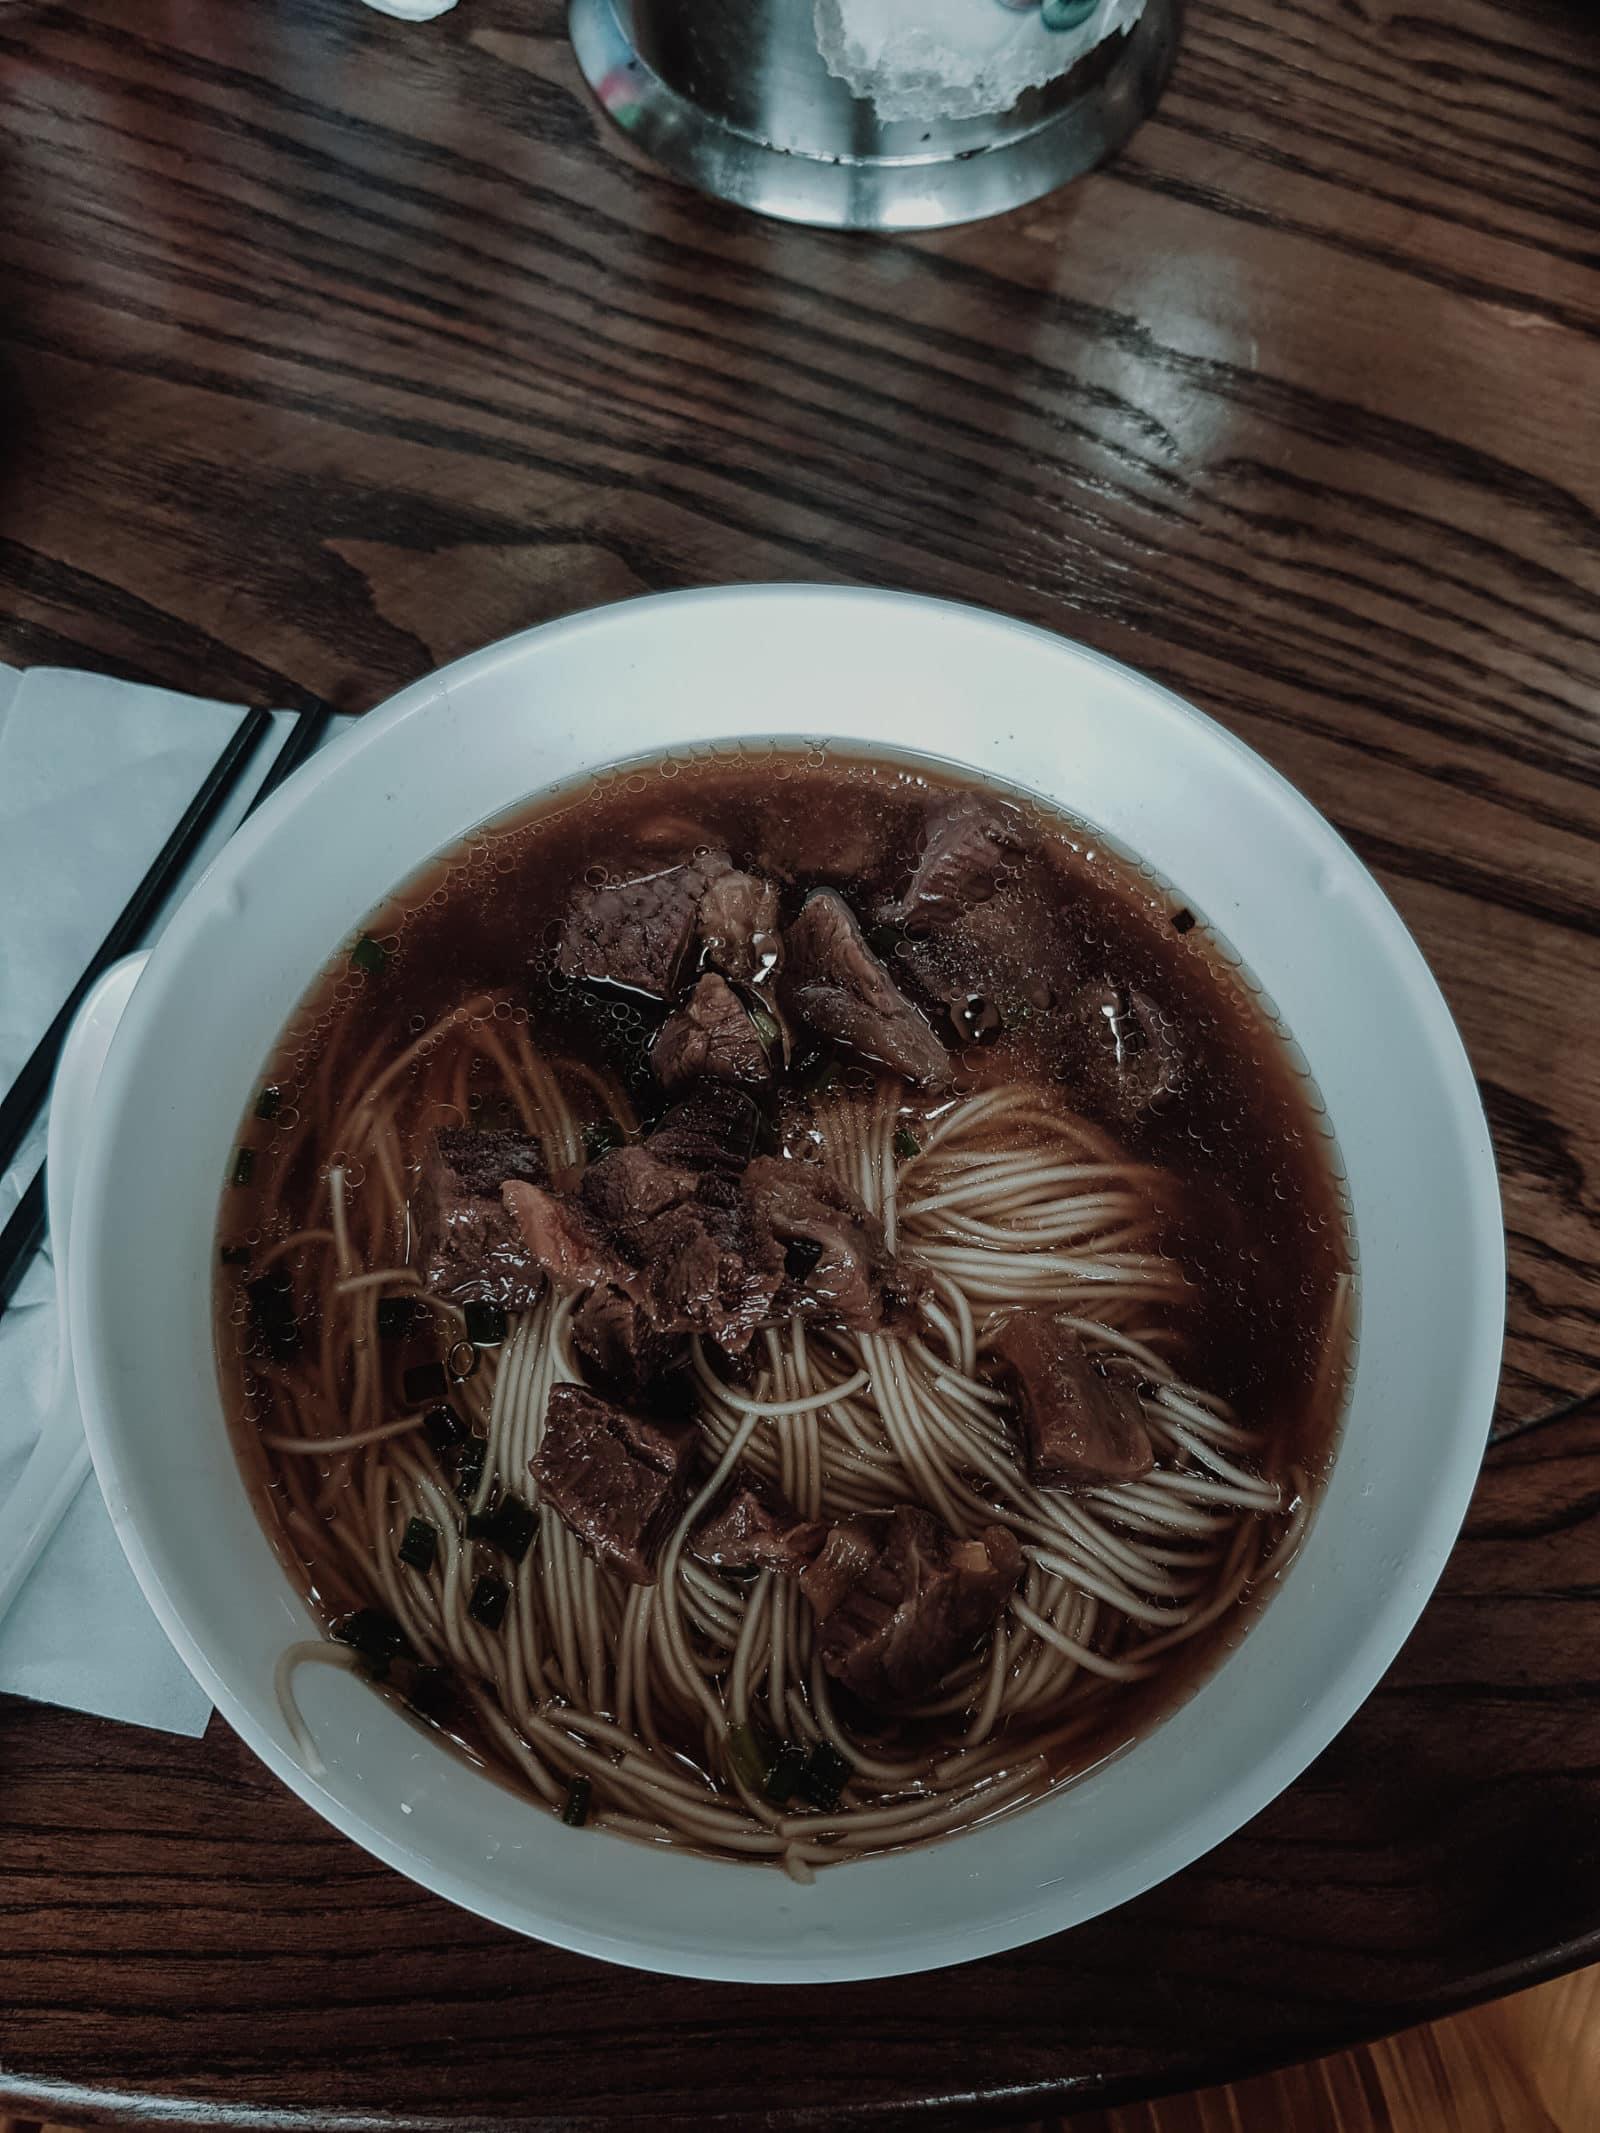 Suzhou Küche Nudeln und Nudelsuppe bei Zhuhongxing